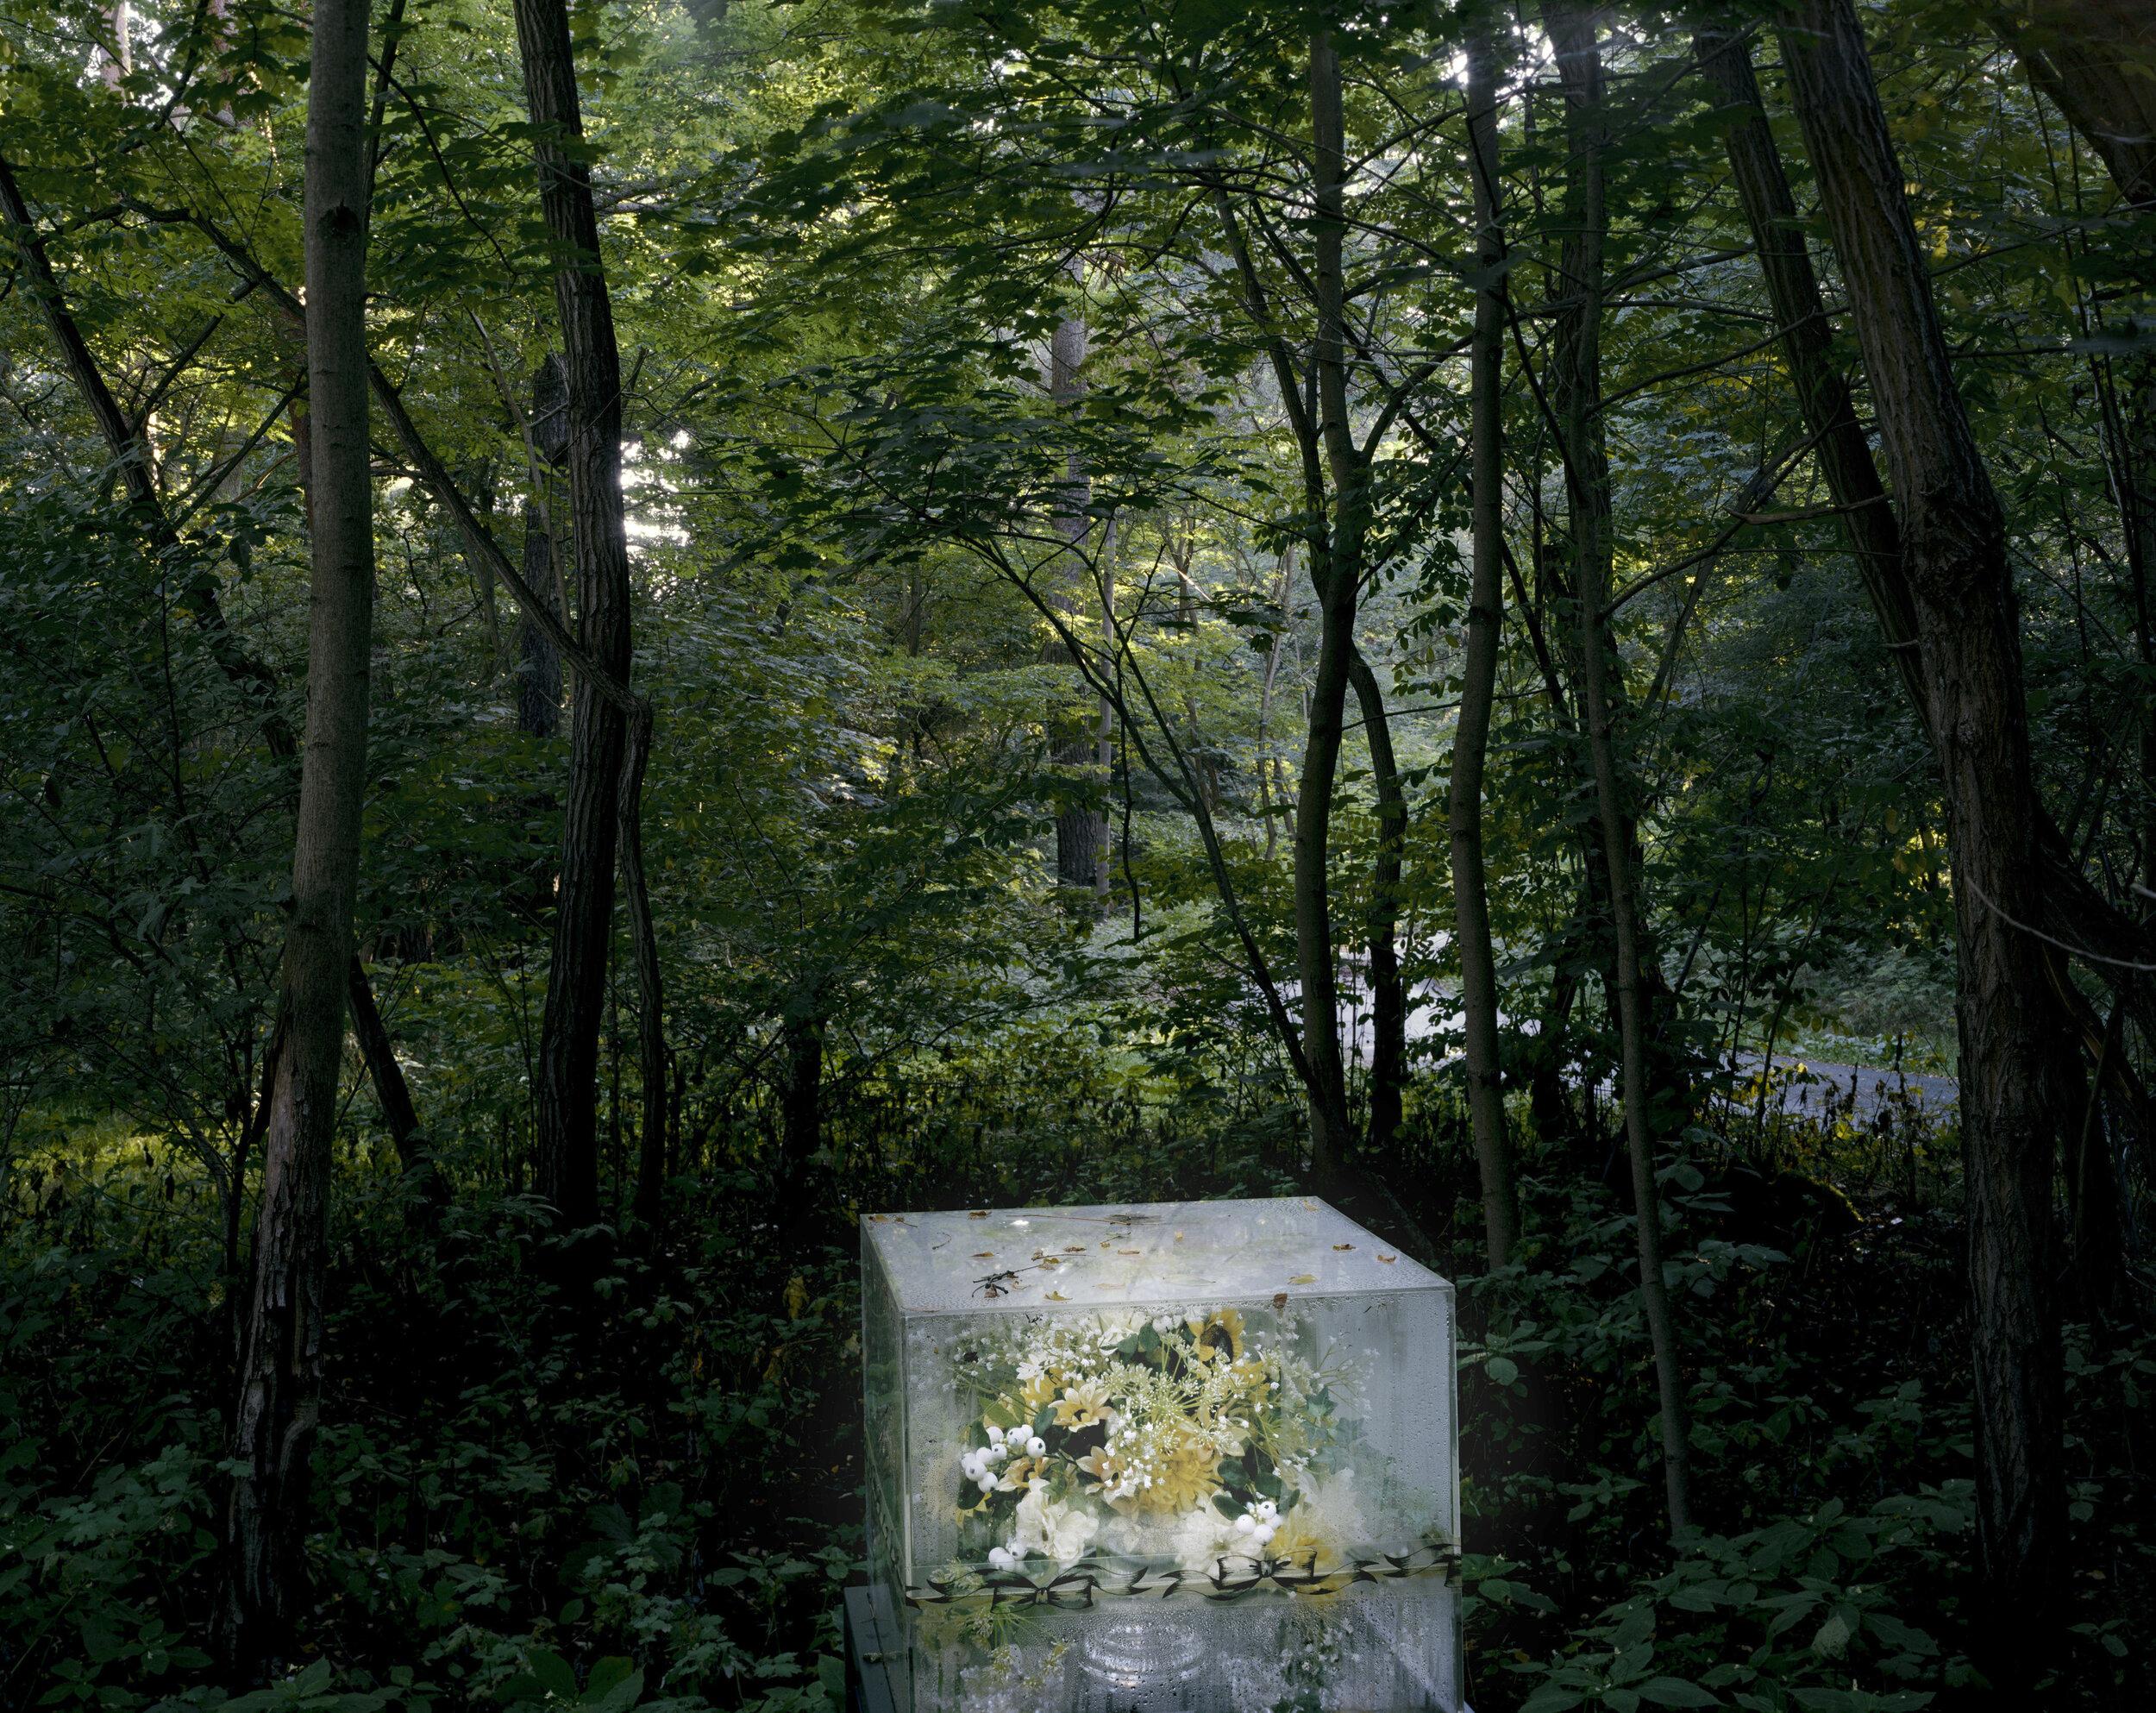 Die seltsamen Tagen, 2013 | Ute & Werner Mahler